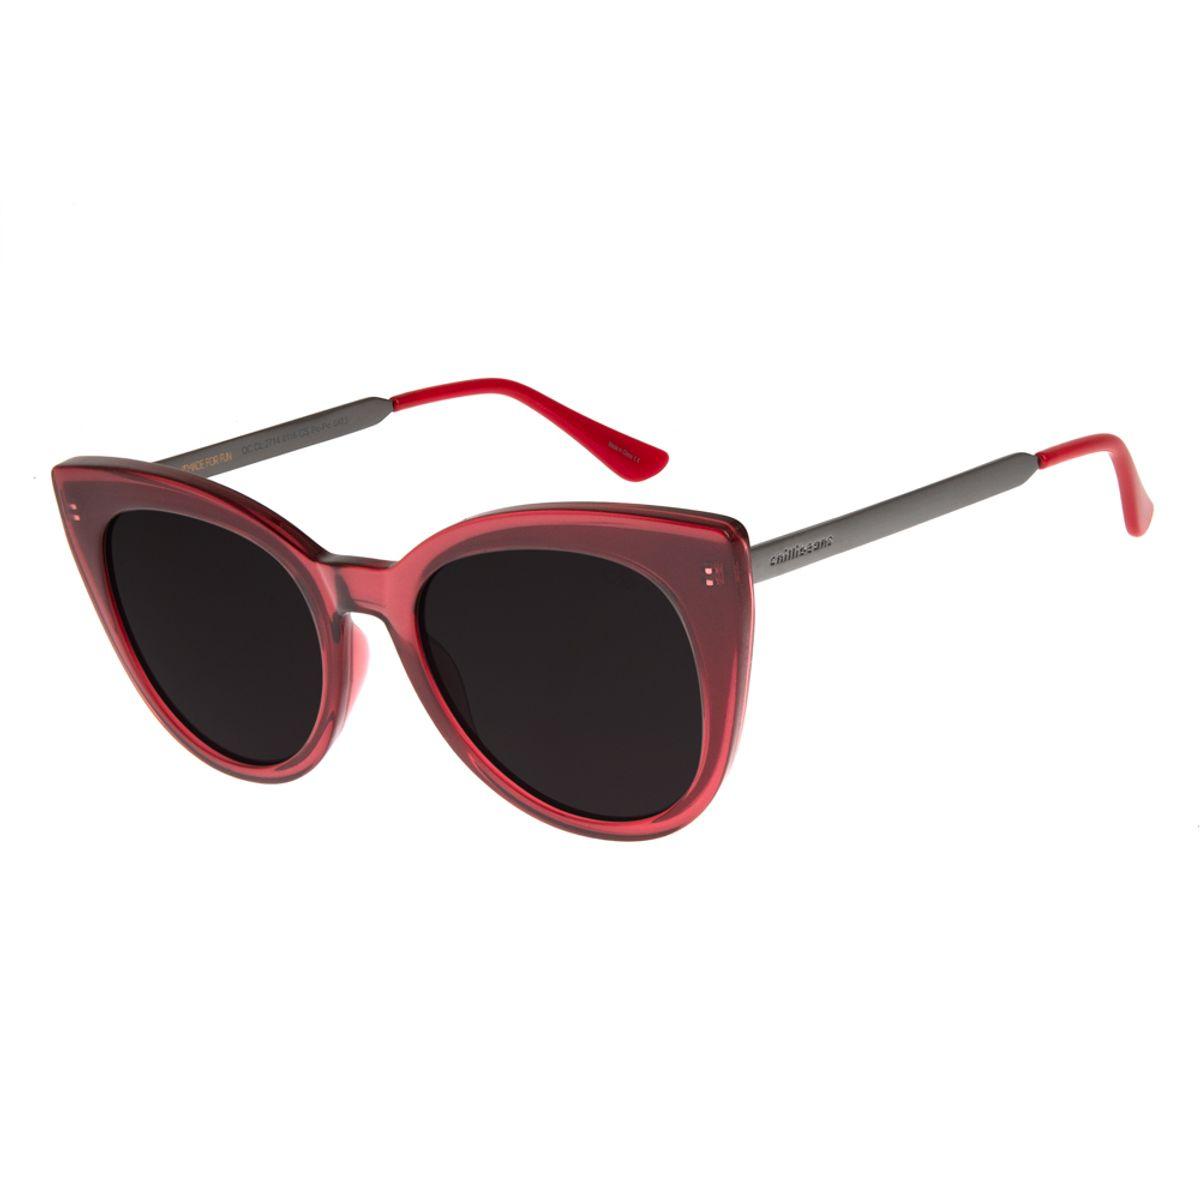 bd2dd60a8f96f Óculos De Sol Chilli Beans Feminino Gatinho Vermelho 2714 - Chilli Beans